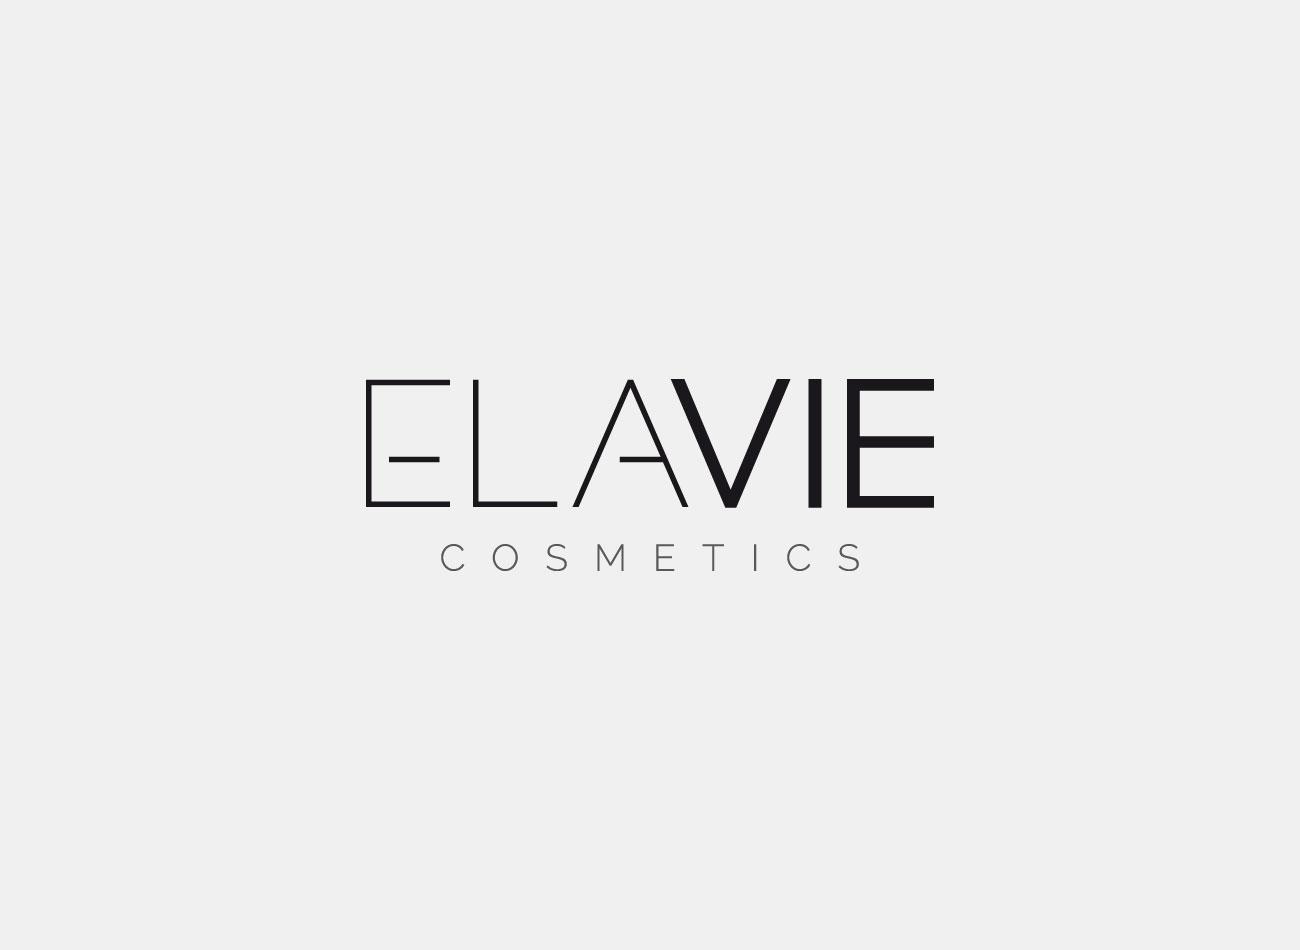 Logo Elavie Cosmetics